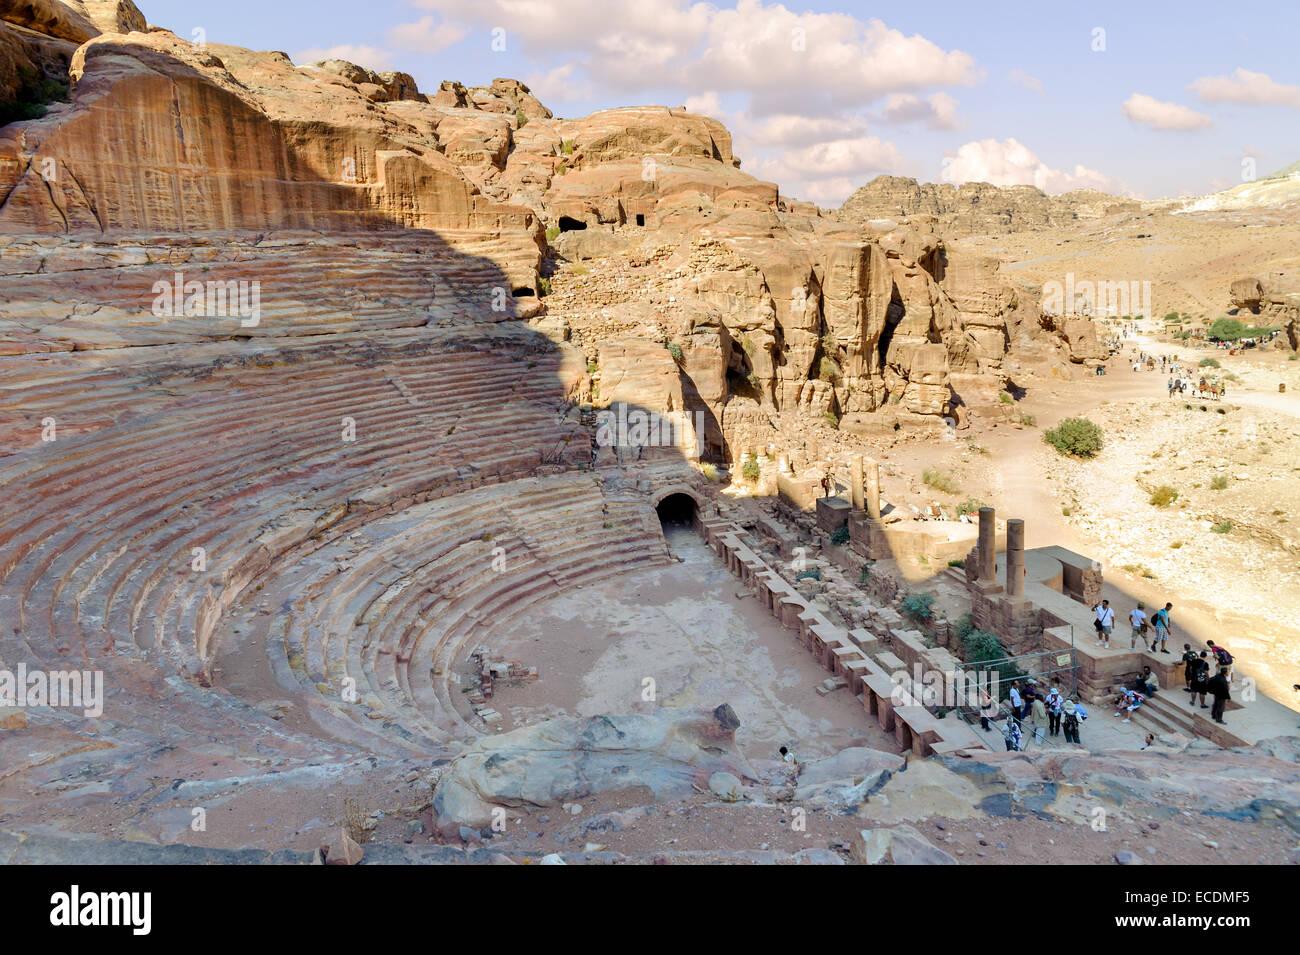 jordan ancient nabataean city petra stockfotos jordan. Black Bedroom Furniture Sets. Home Design Ideas